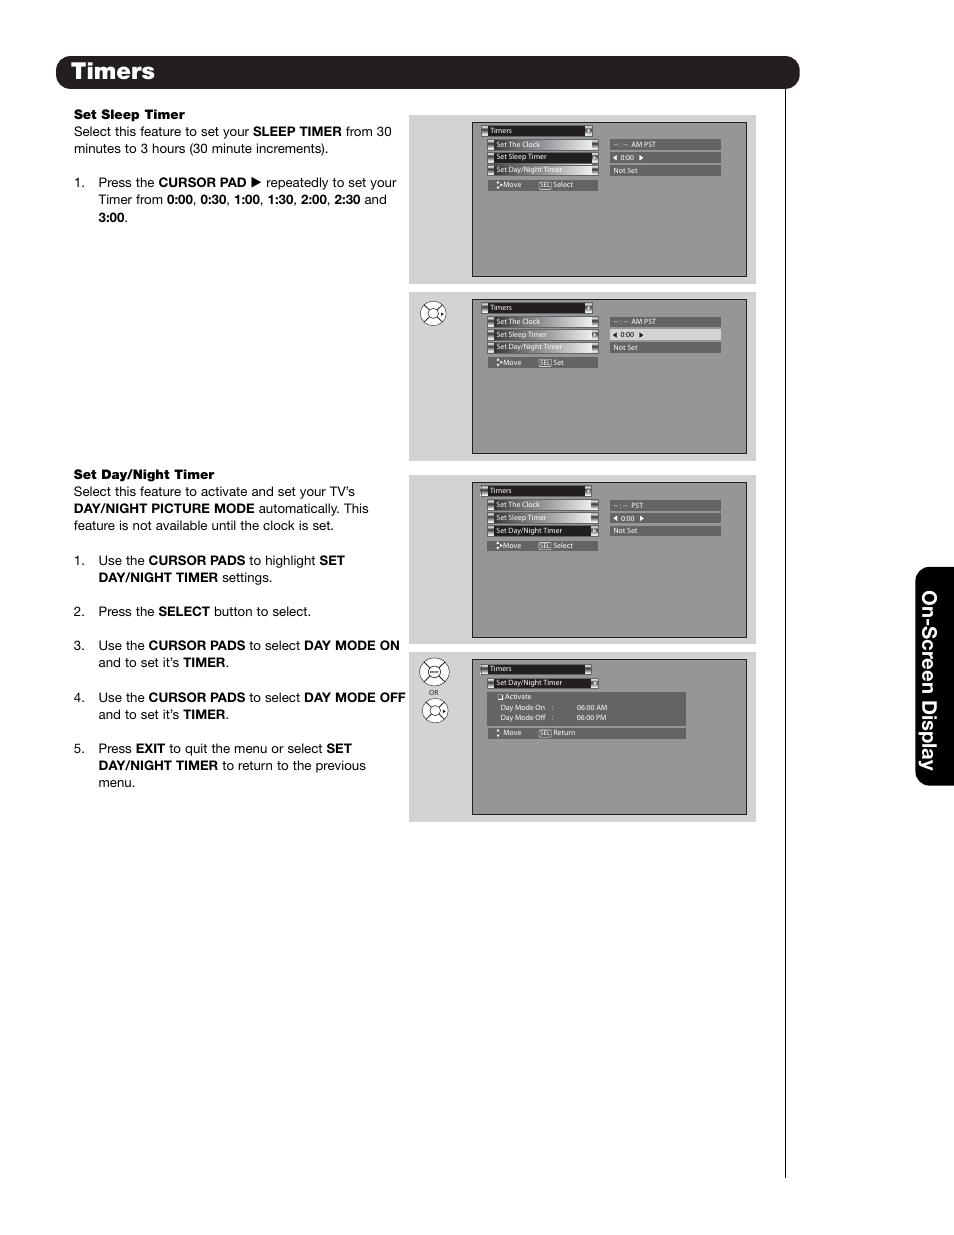 timers on scr een display hitachi 55hdt79 user manual page 65 rh manualsdir com Verizon LG User Manual hitachi 55hdt79 service manual